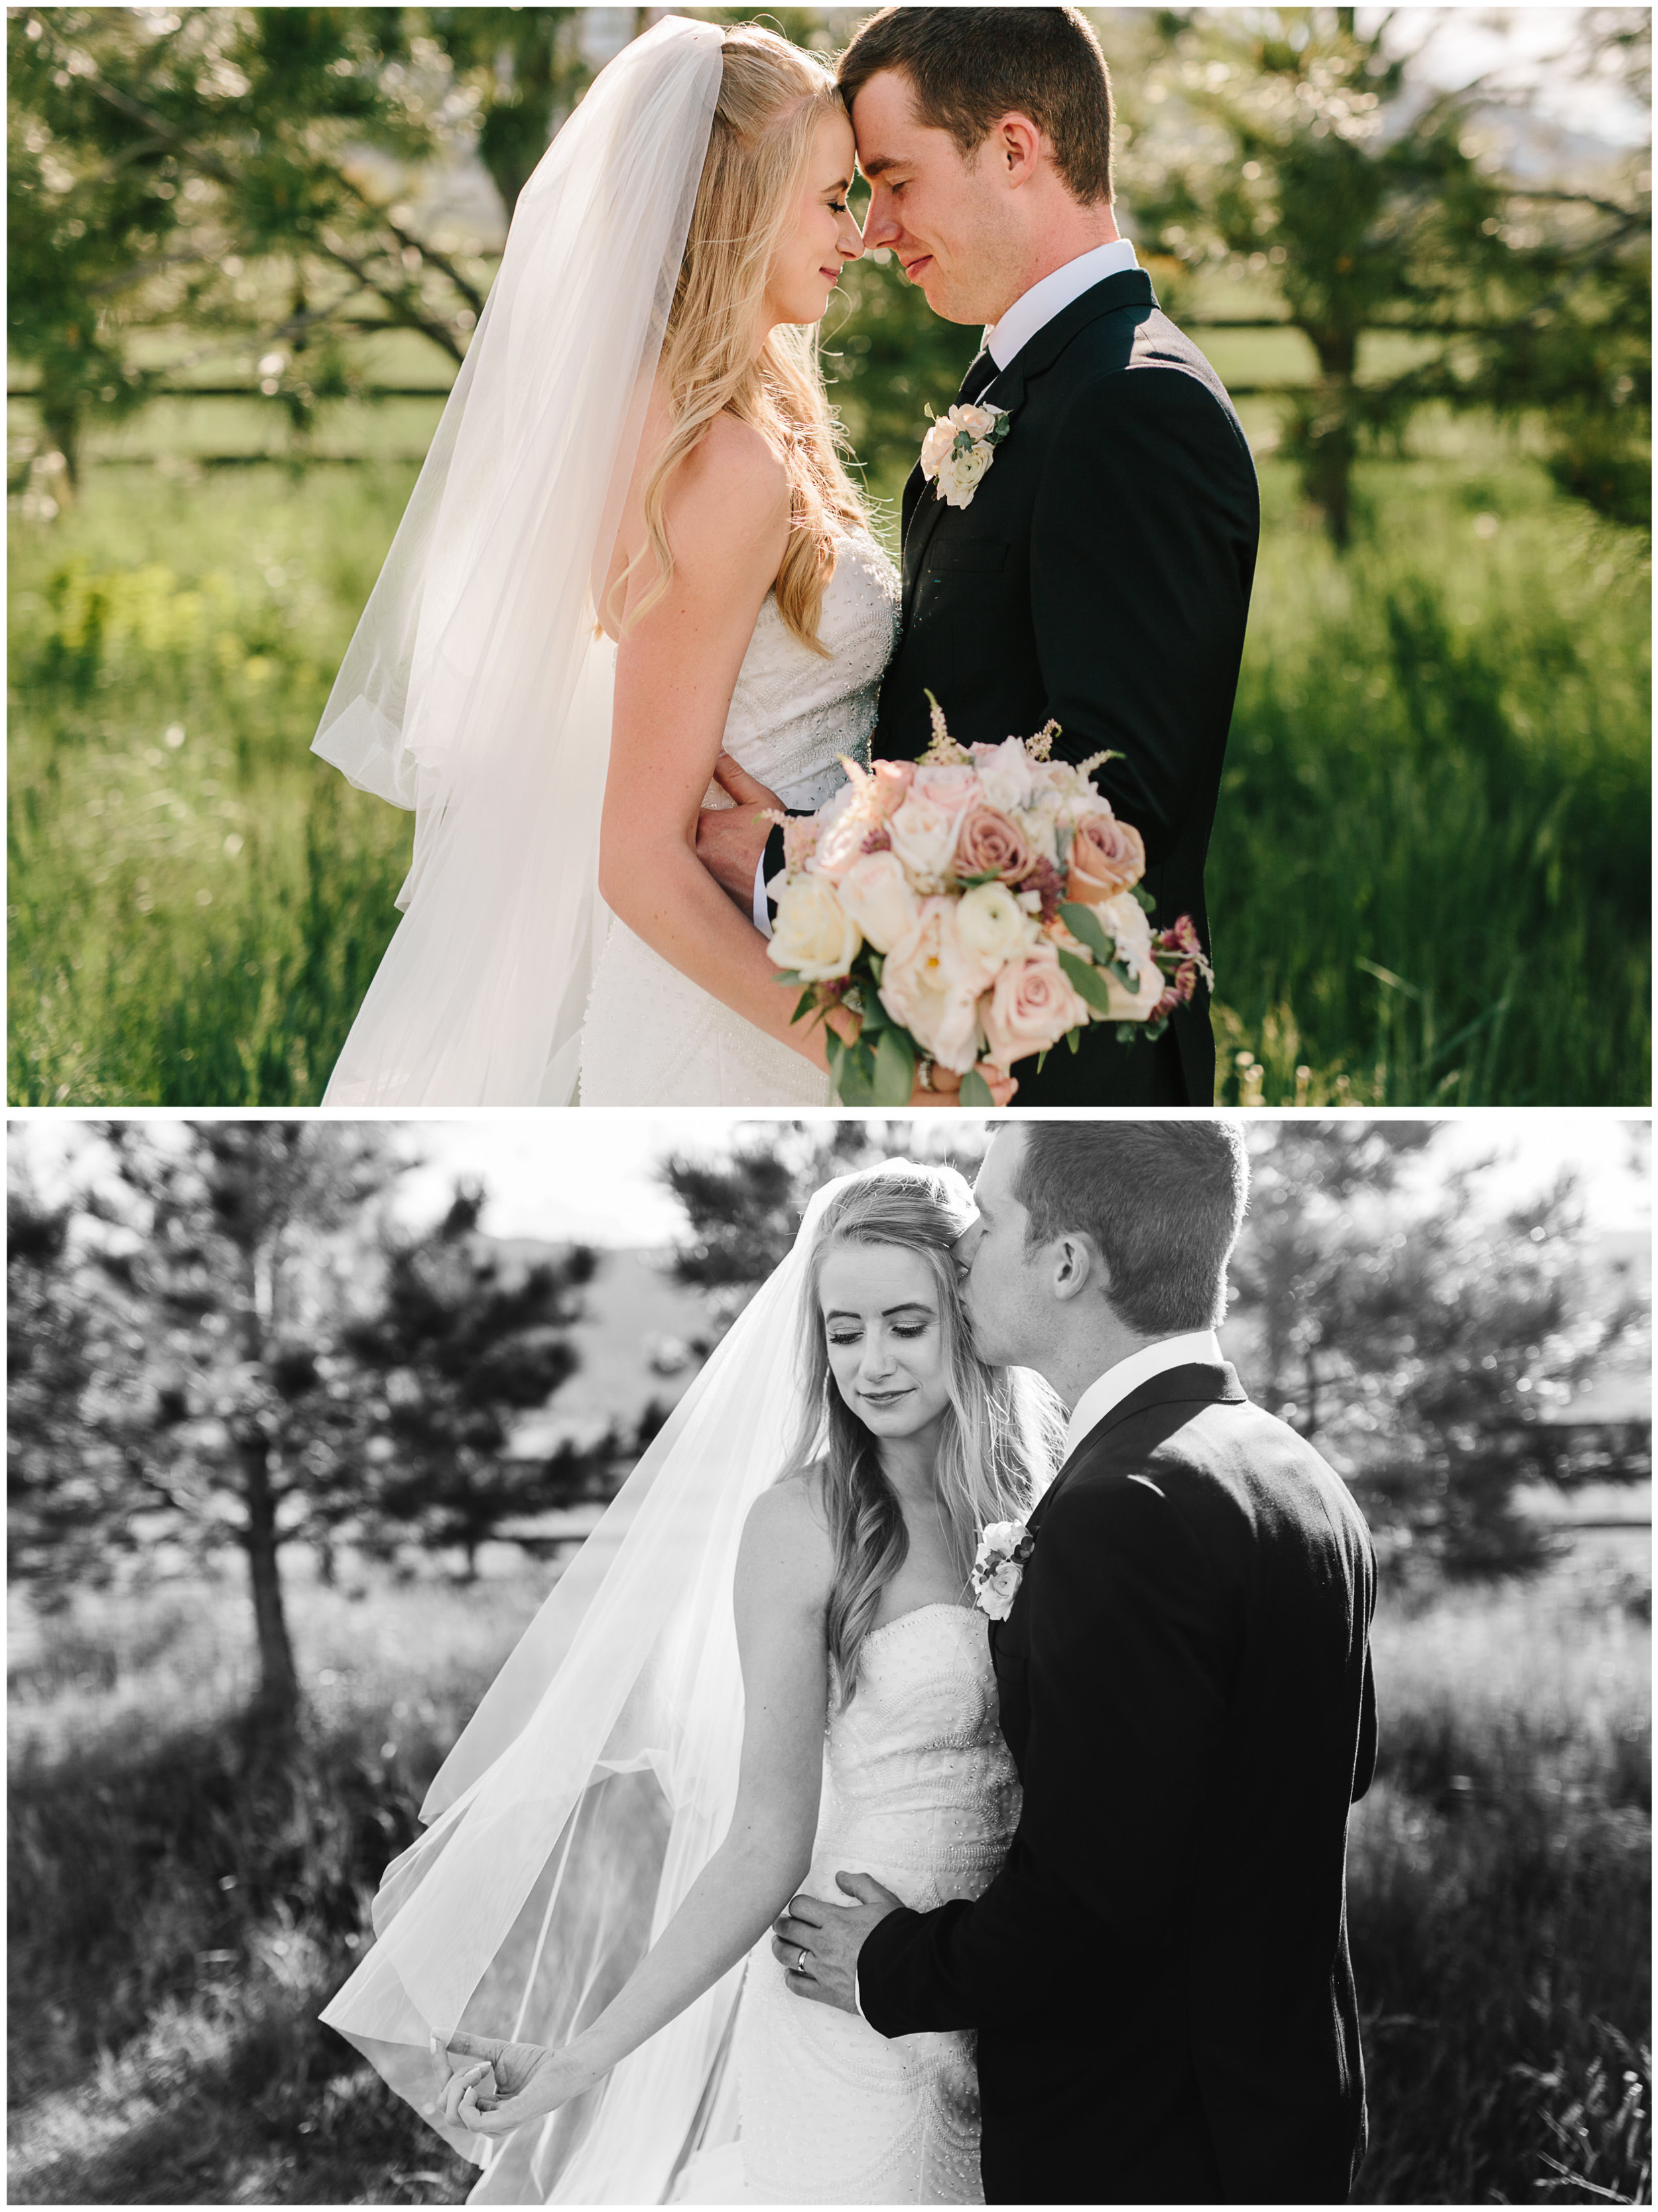 spruce_mountain_ranch_wedding_38.jpg